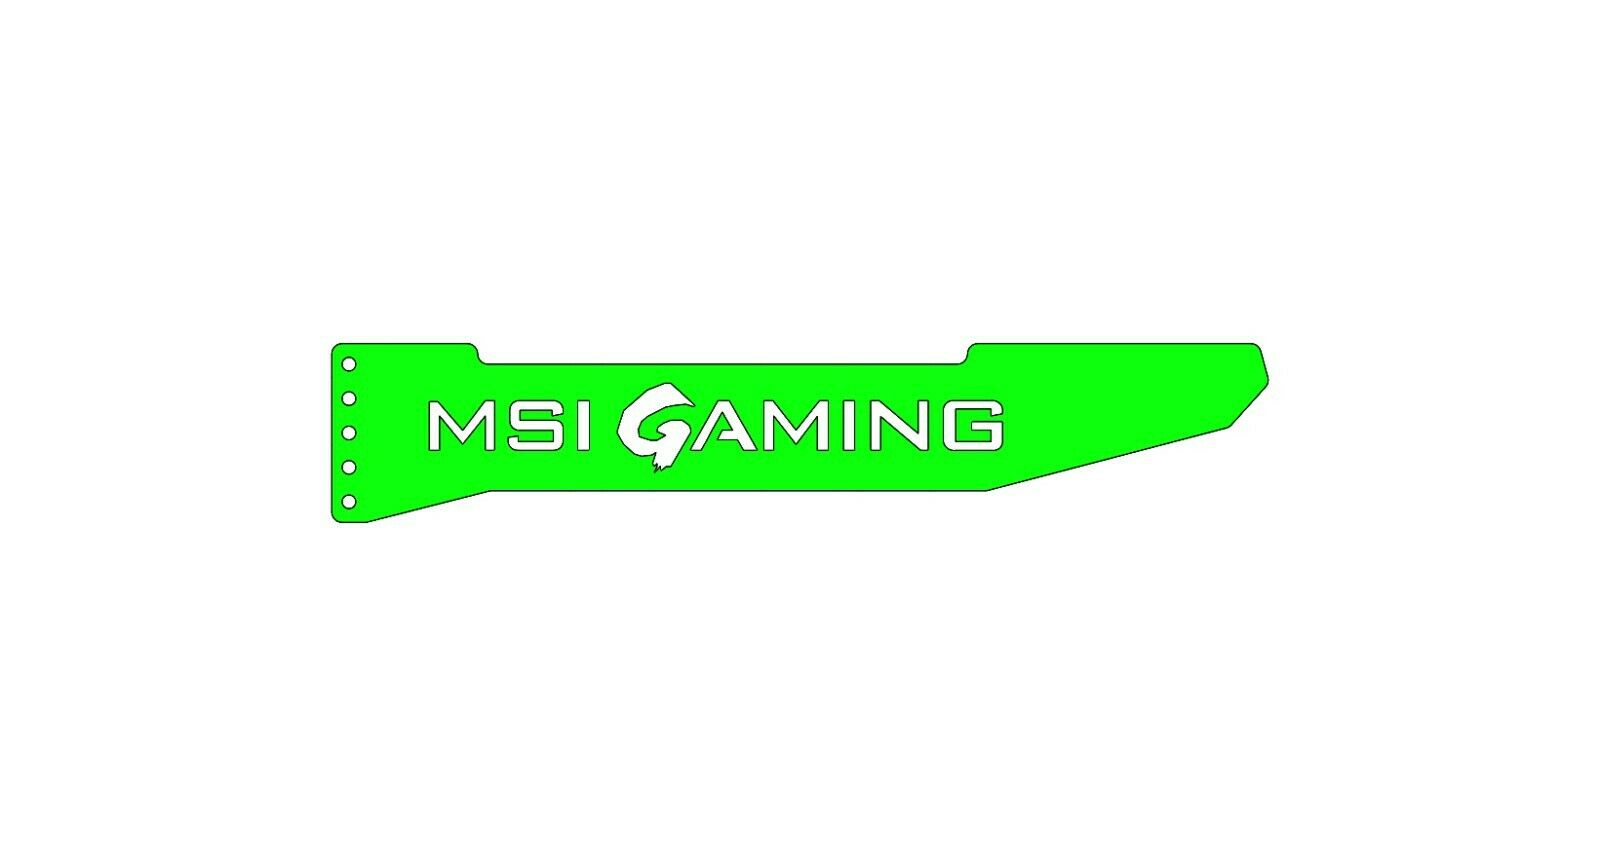 MSI GAMING - ARGB GPU Graphics Card Sag Support Bracket Brace GTX RTX AMD NVIDIA